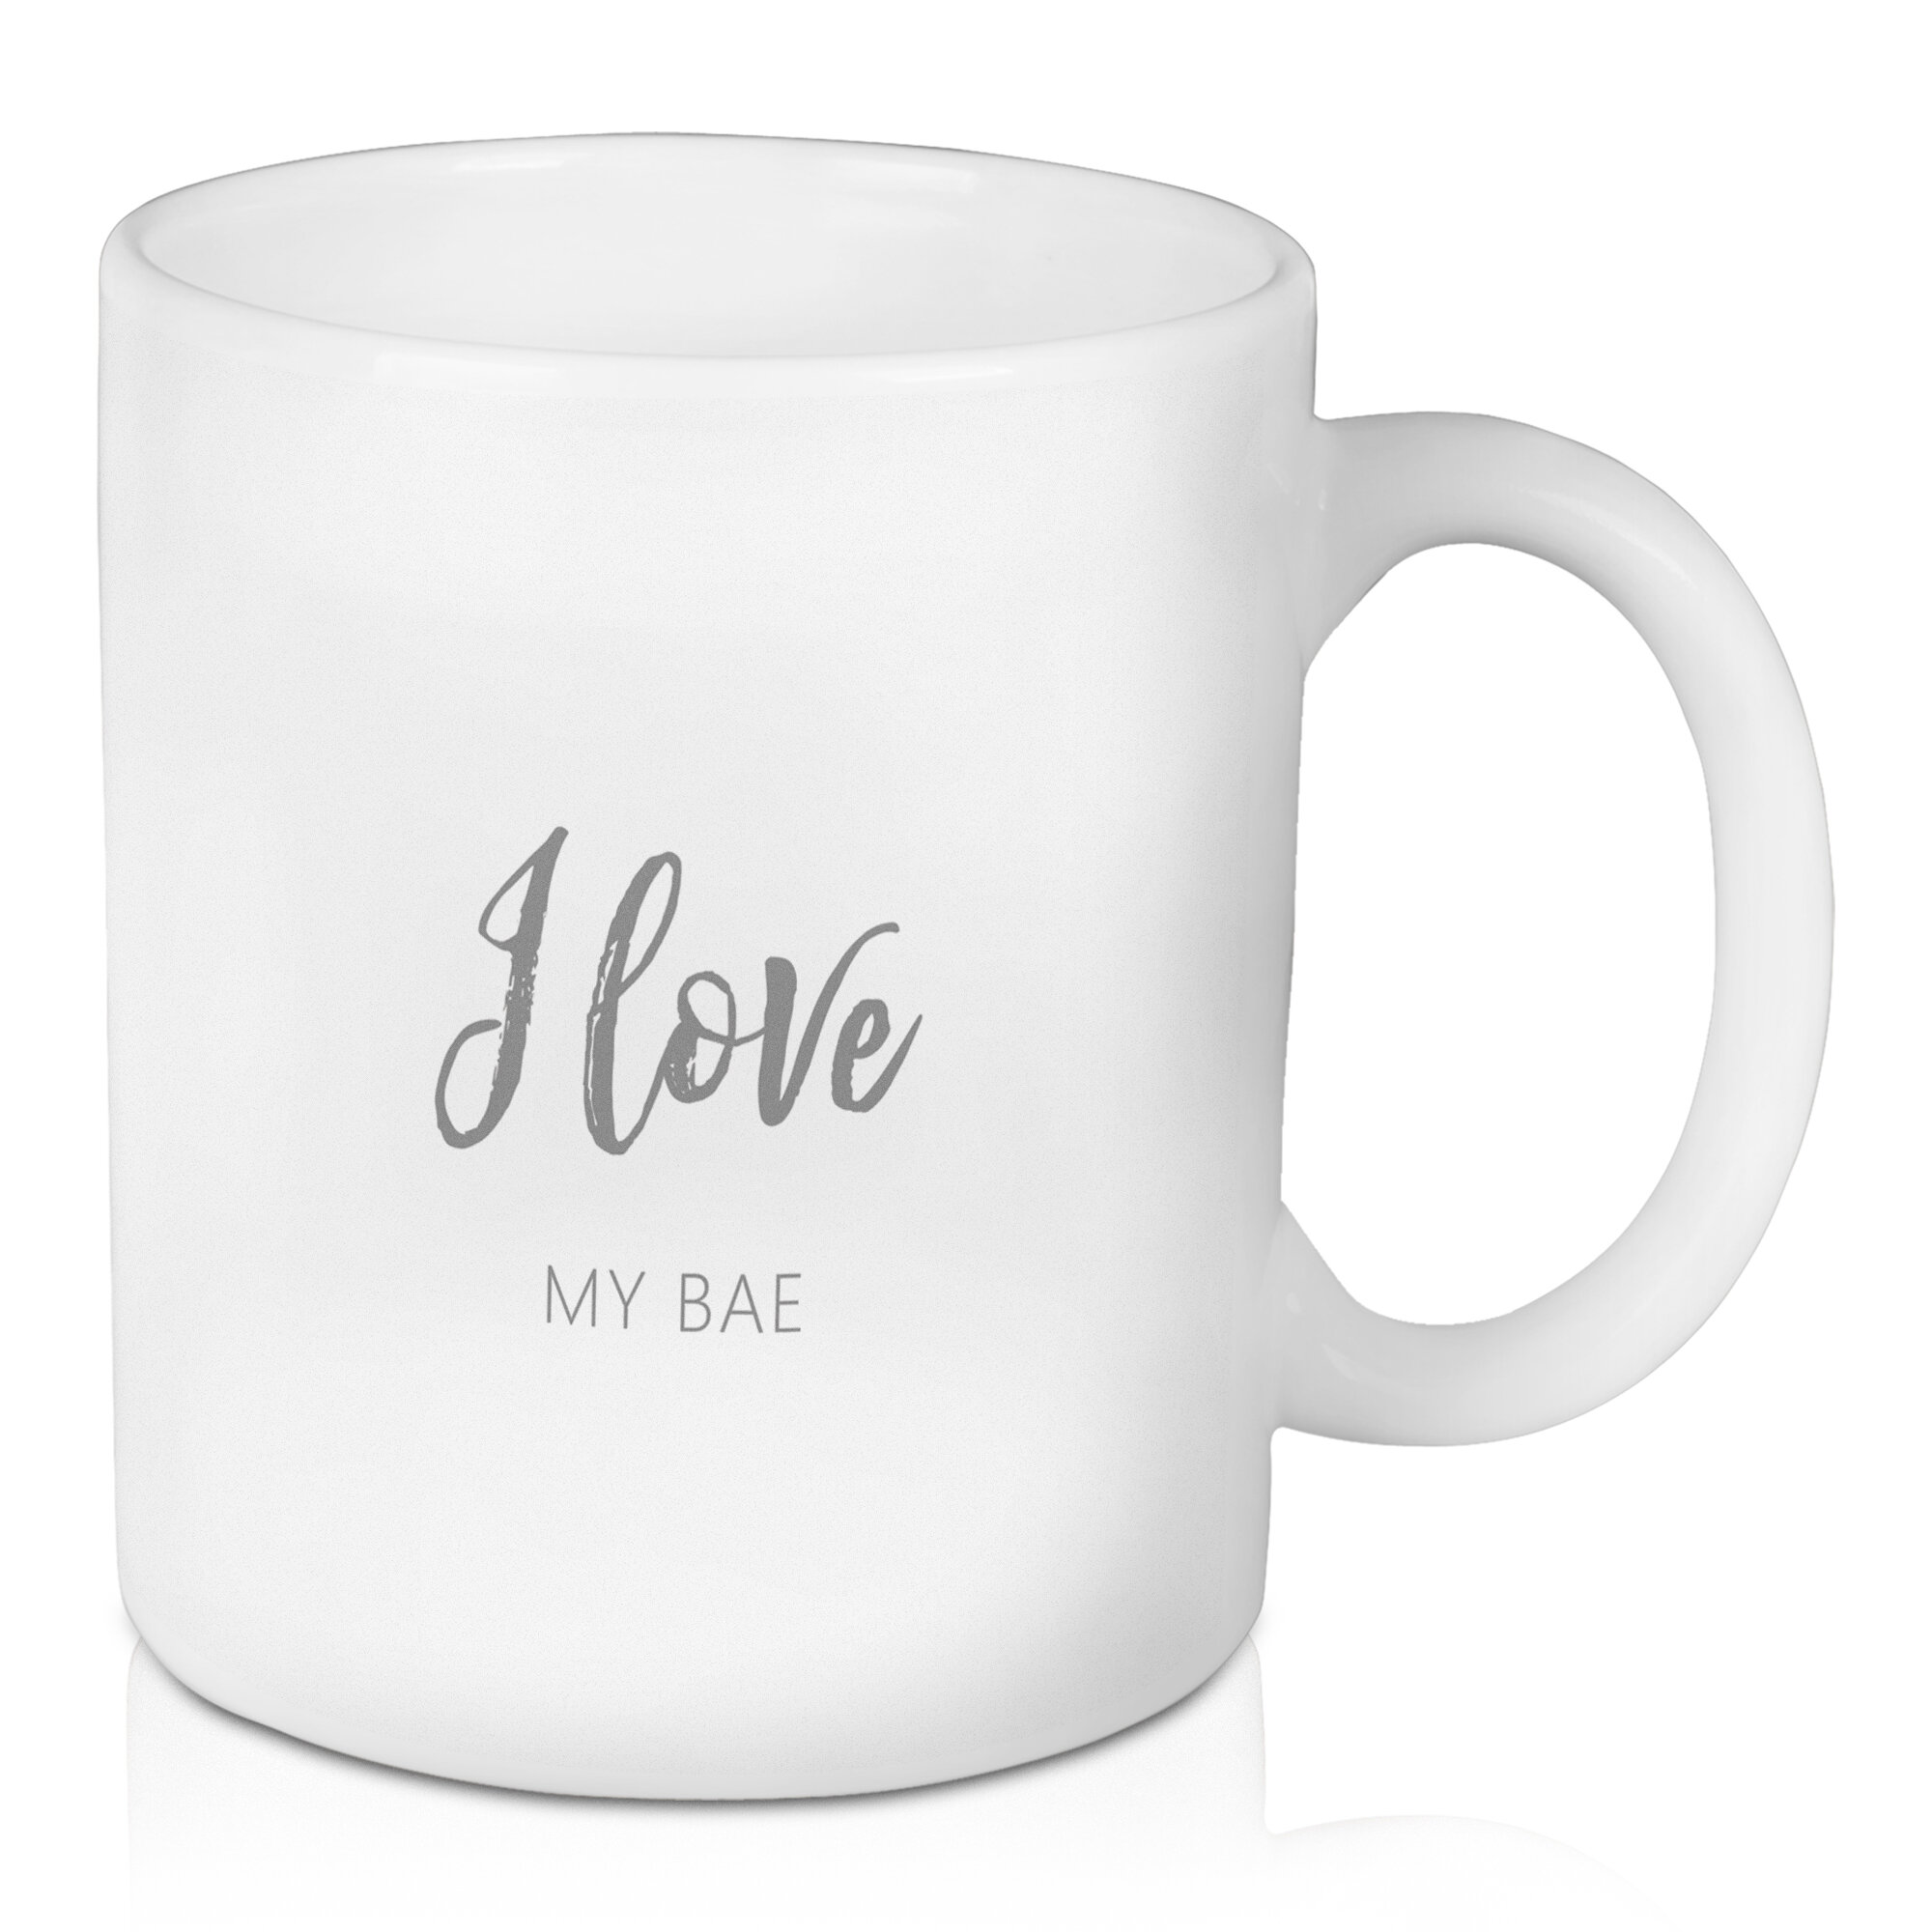 East Urban Home I Love My Bae Coffee Mug Wayfair